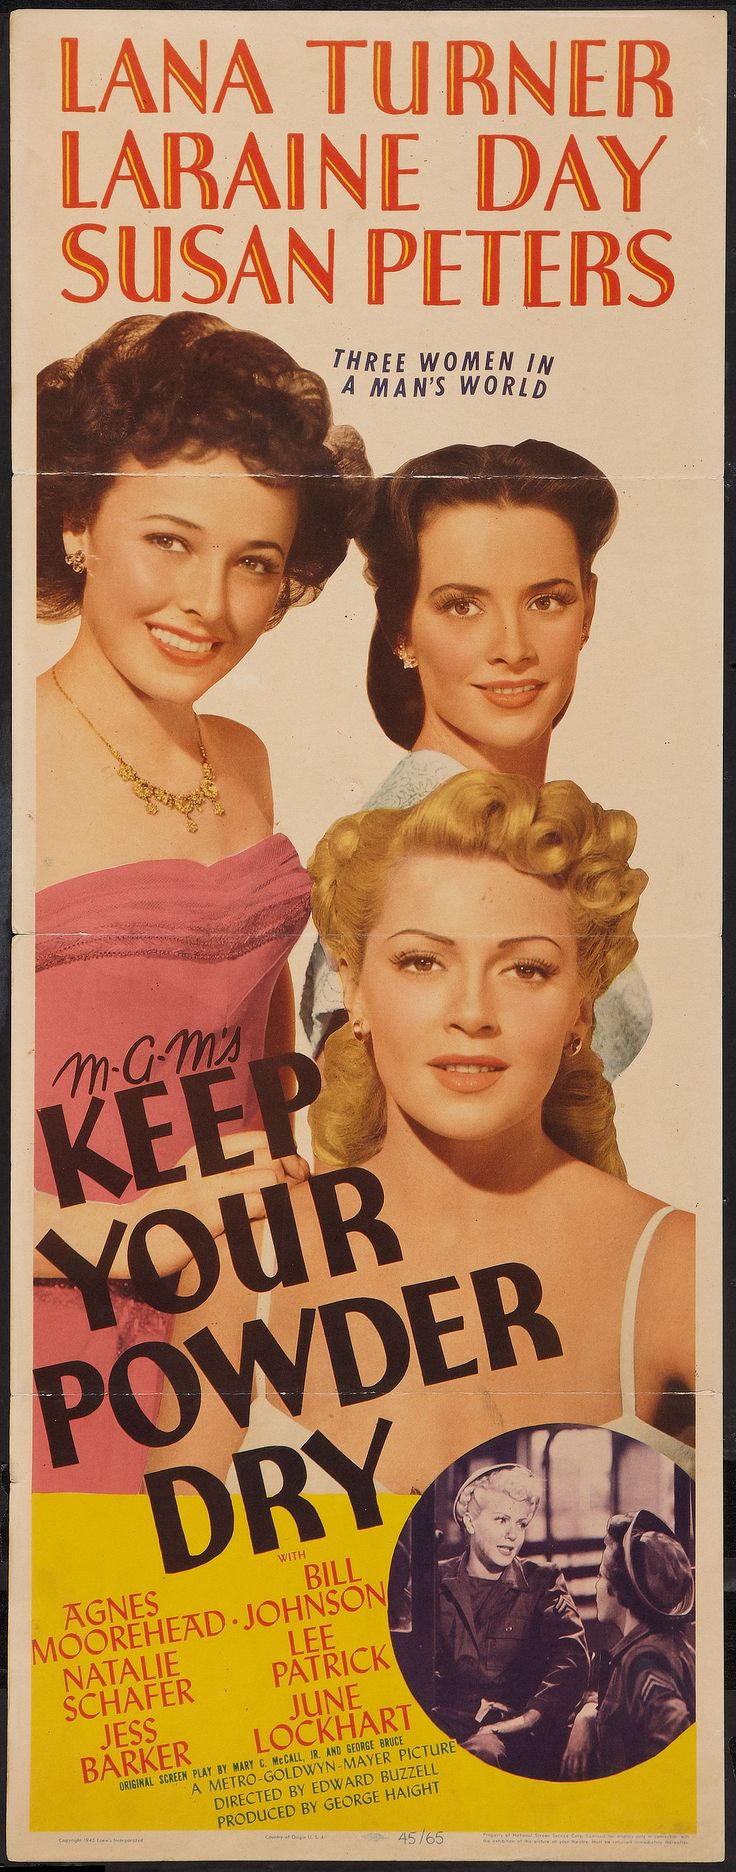 "Lana Turner, Laraine Day, Susan Peters in ""Three Women in a Man's World"""